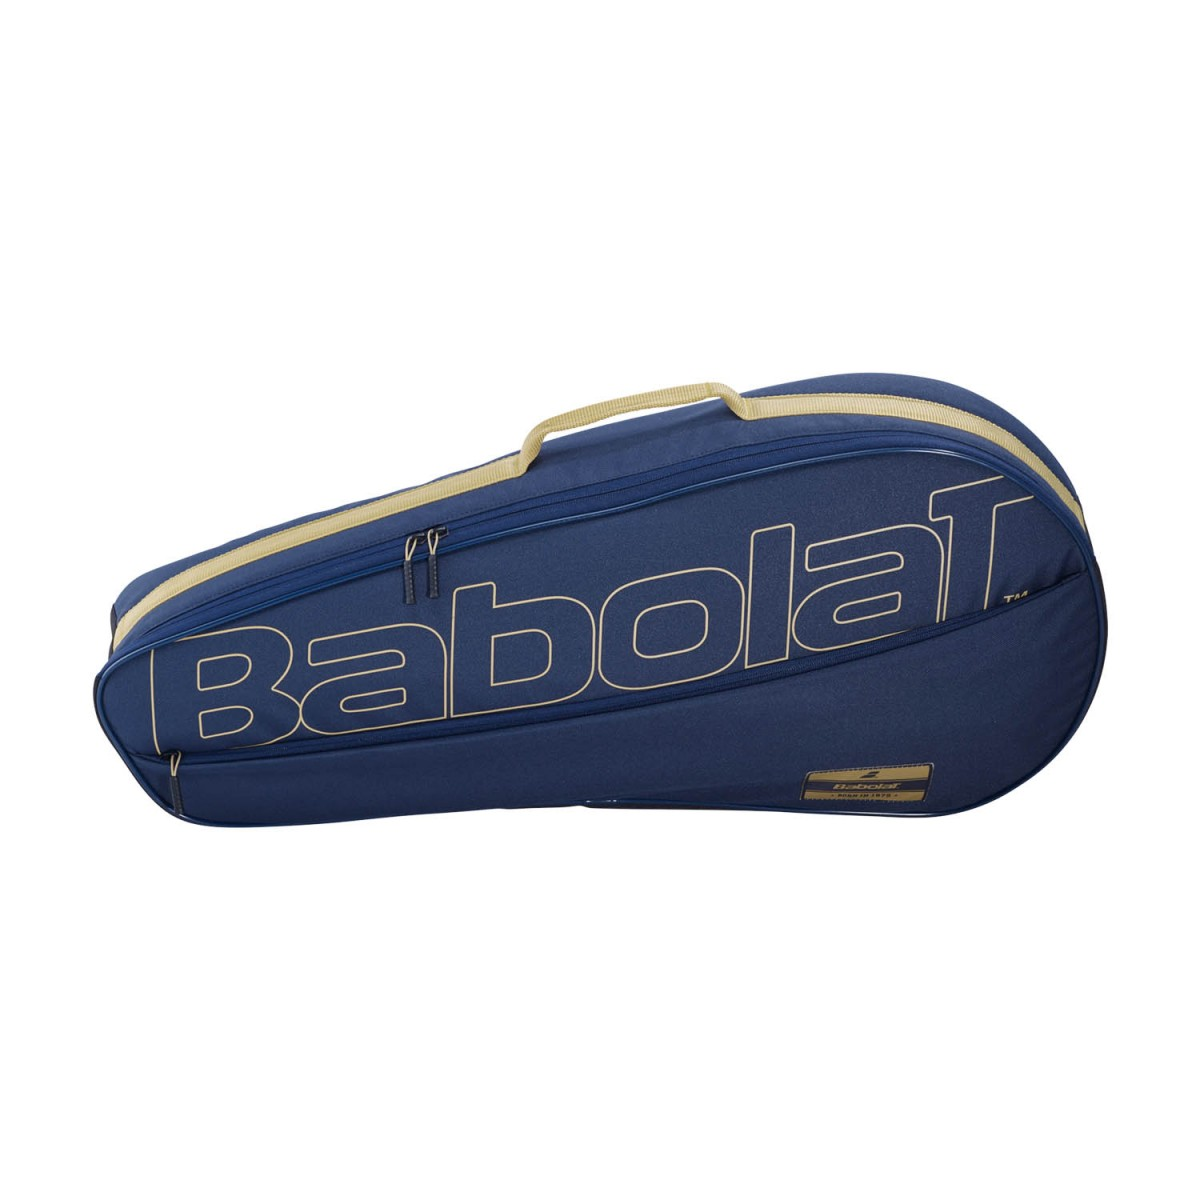 Теннисная сумка Babolat Essential Club x3 dark blue